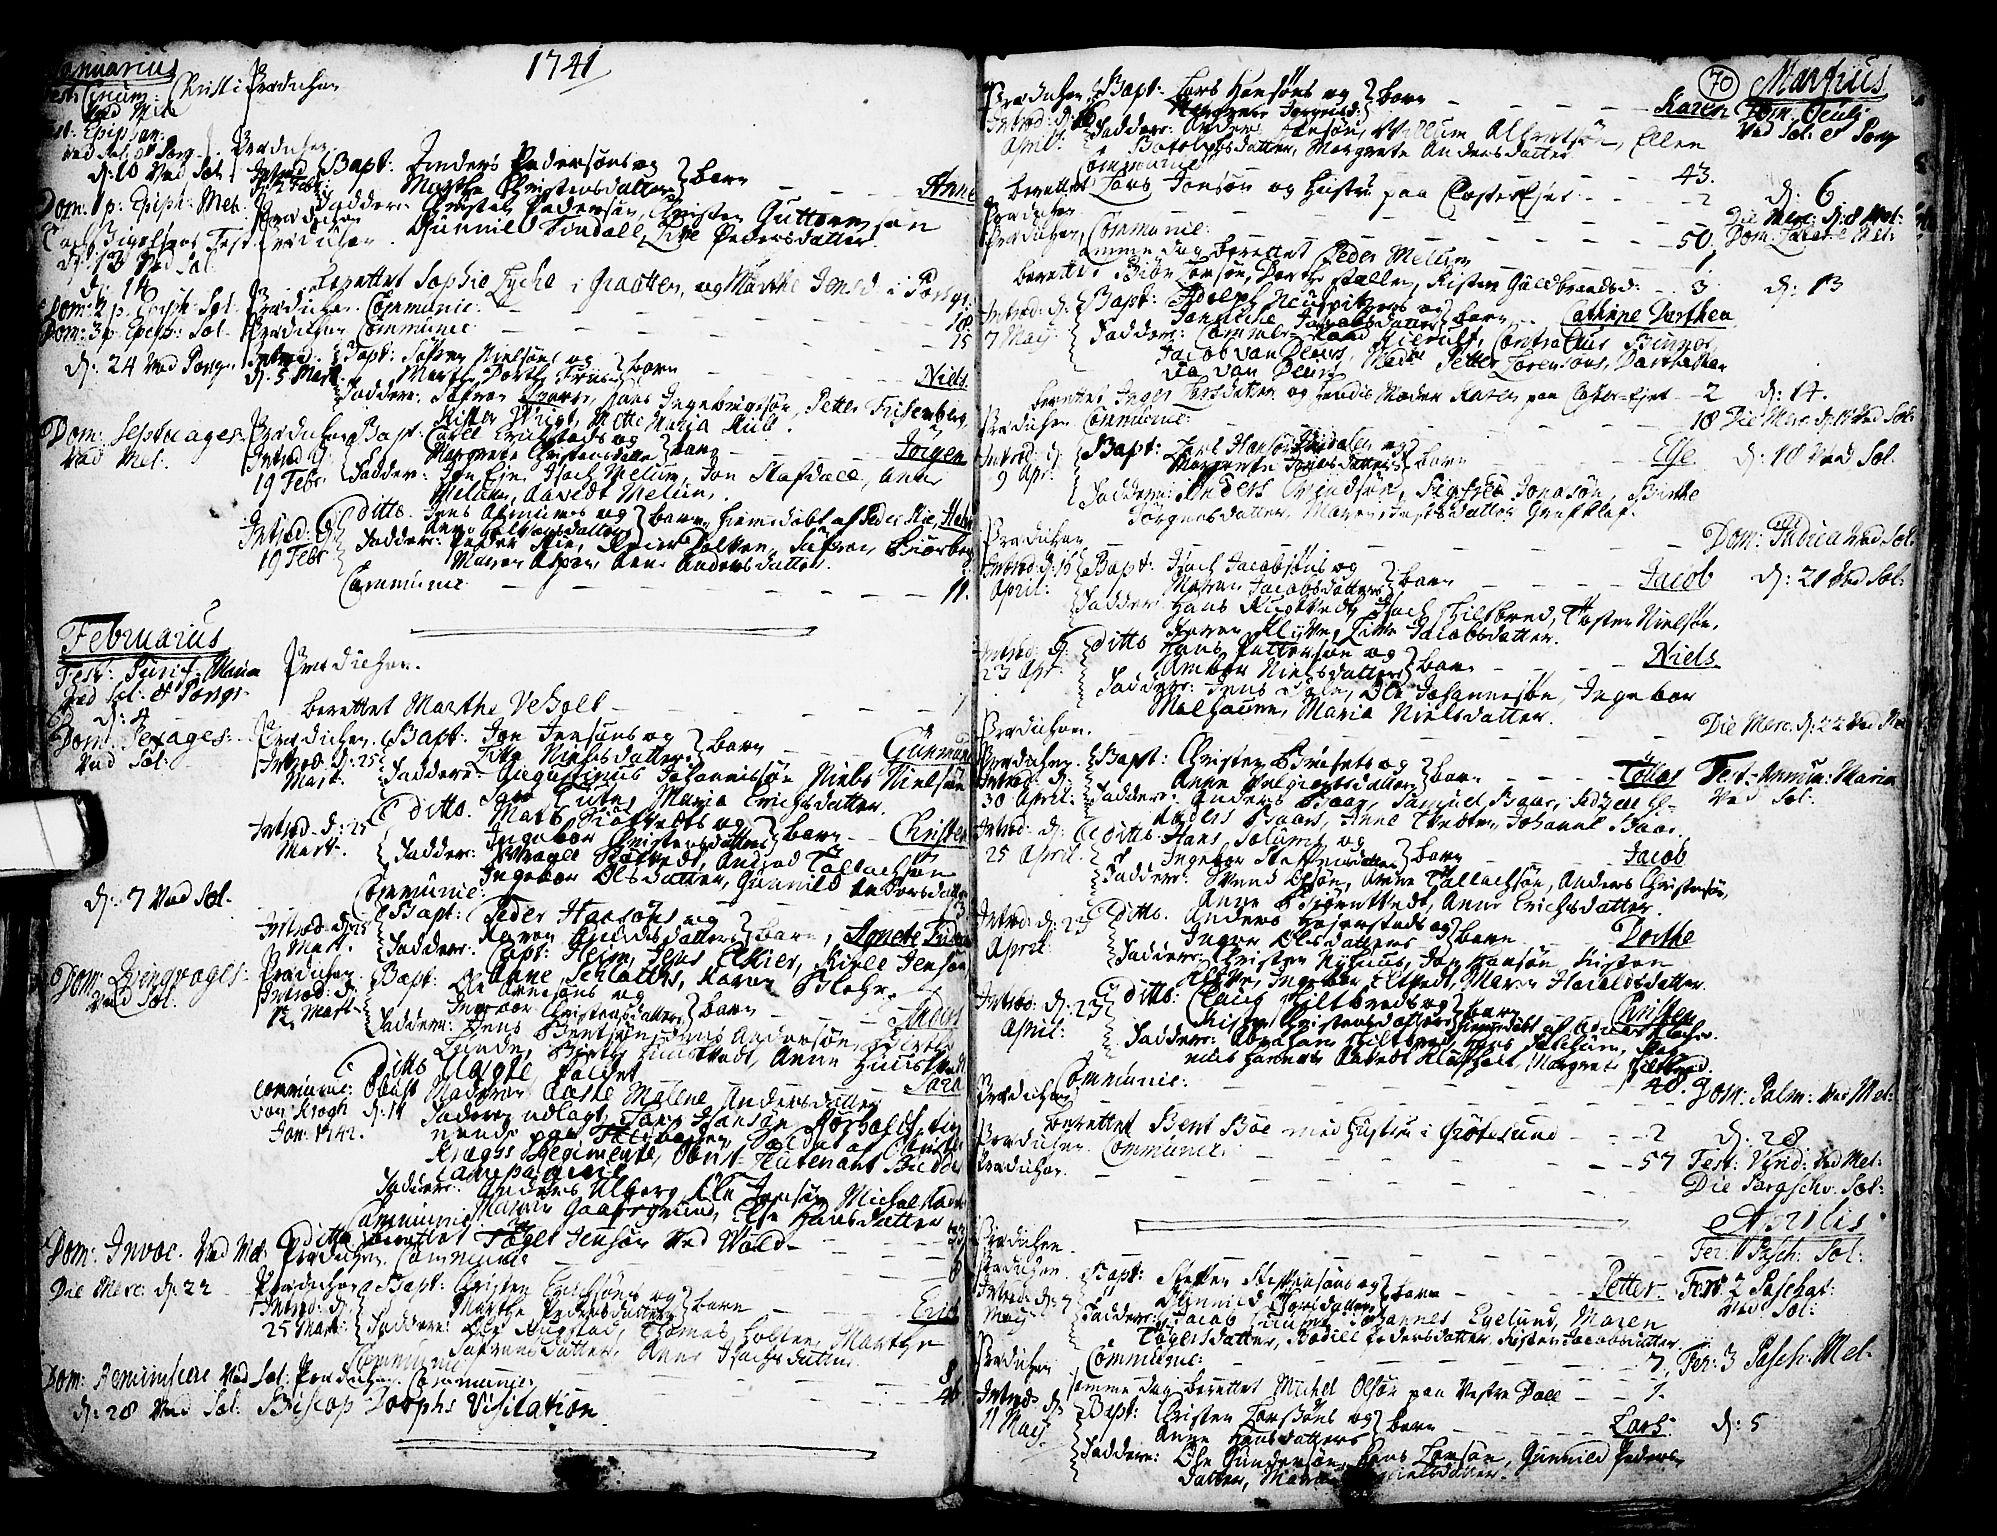 SAKO, Solum kirkebøker, F/Fa/L0002: Ministerialbok nr. I 2, 1713-1761, s. 70